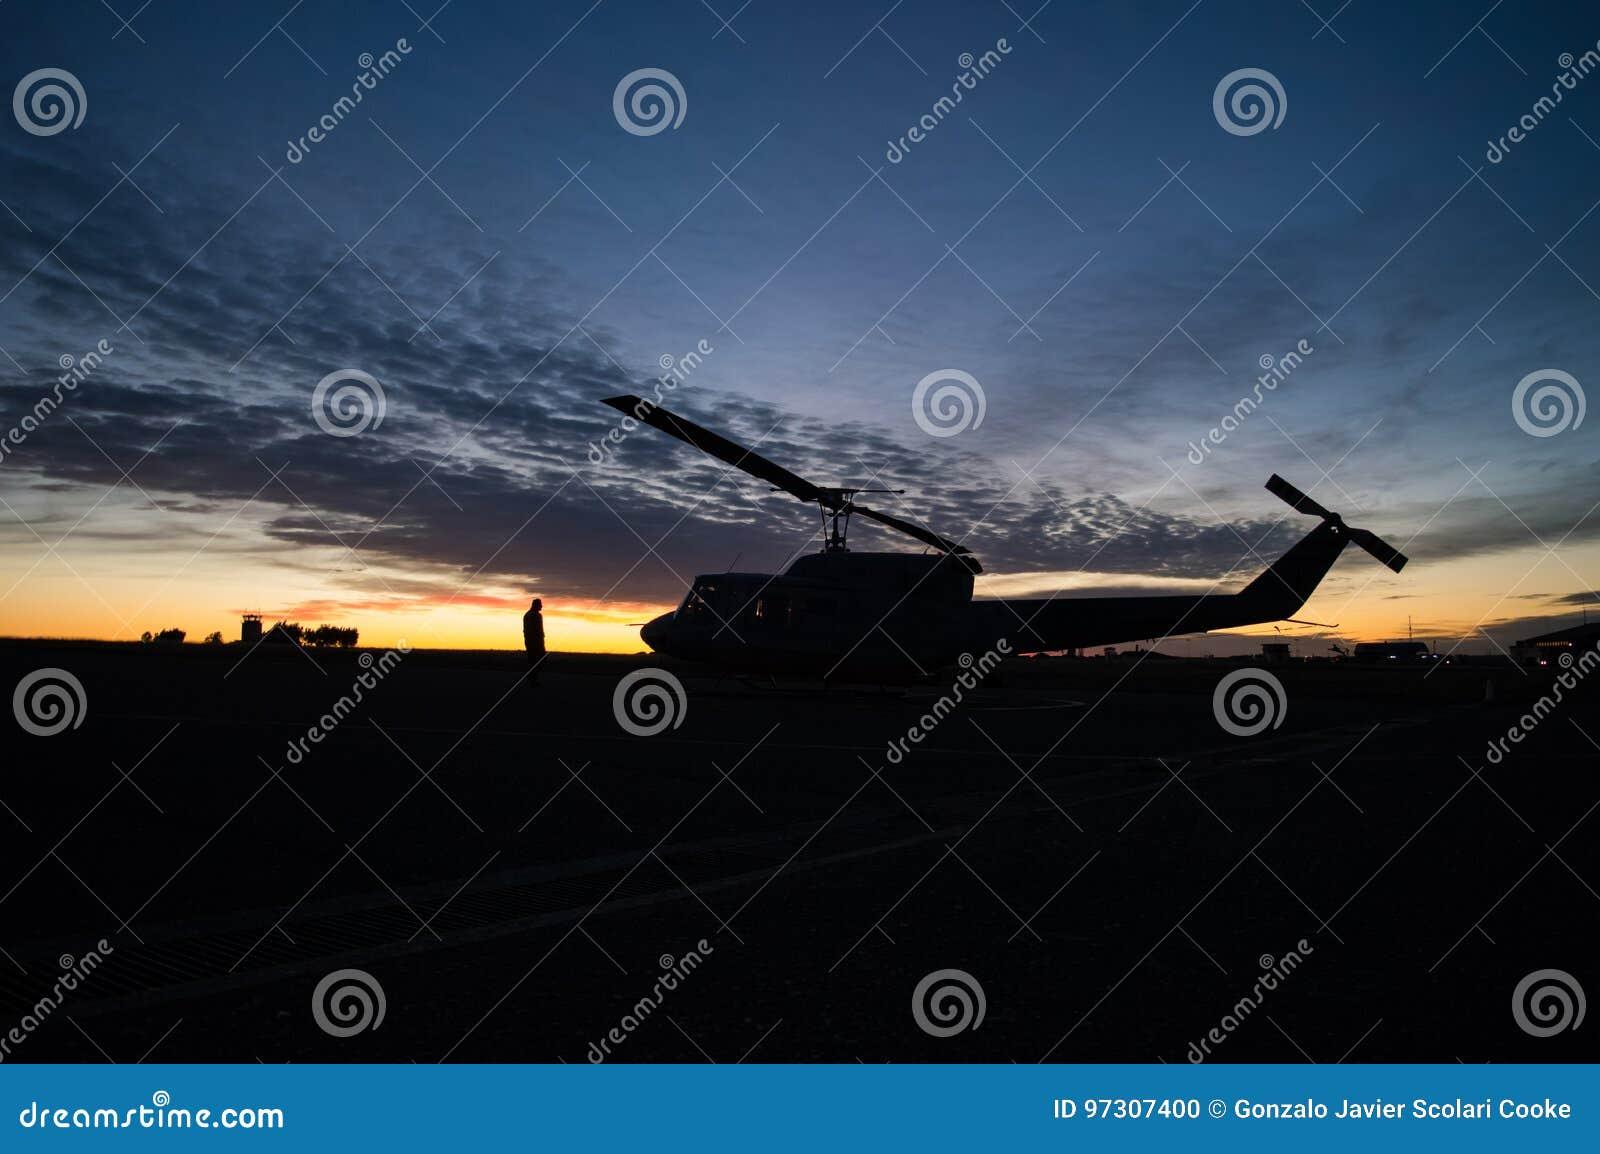 Silueta del helicóptero